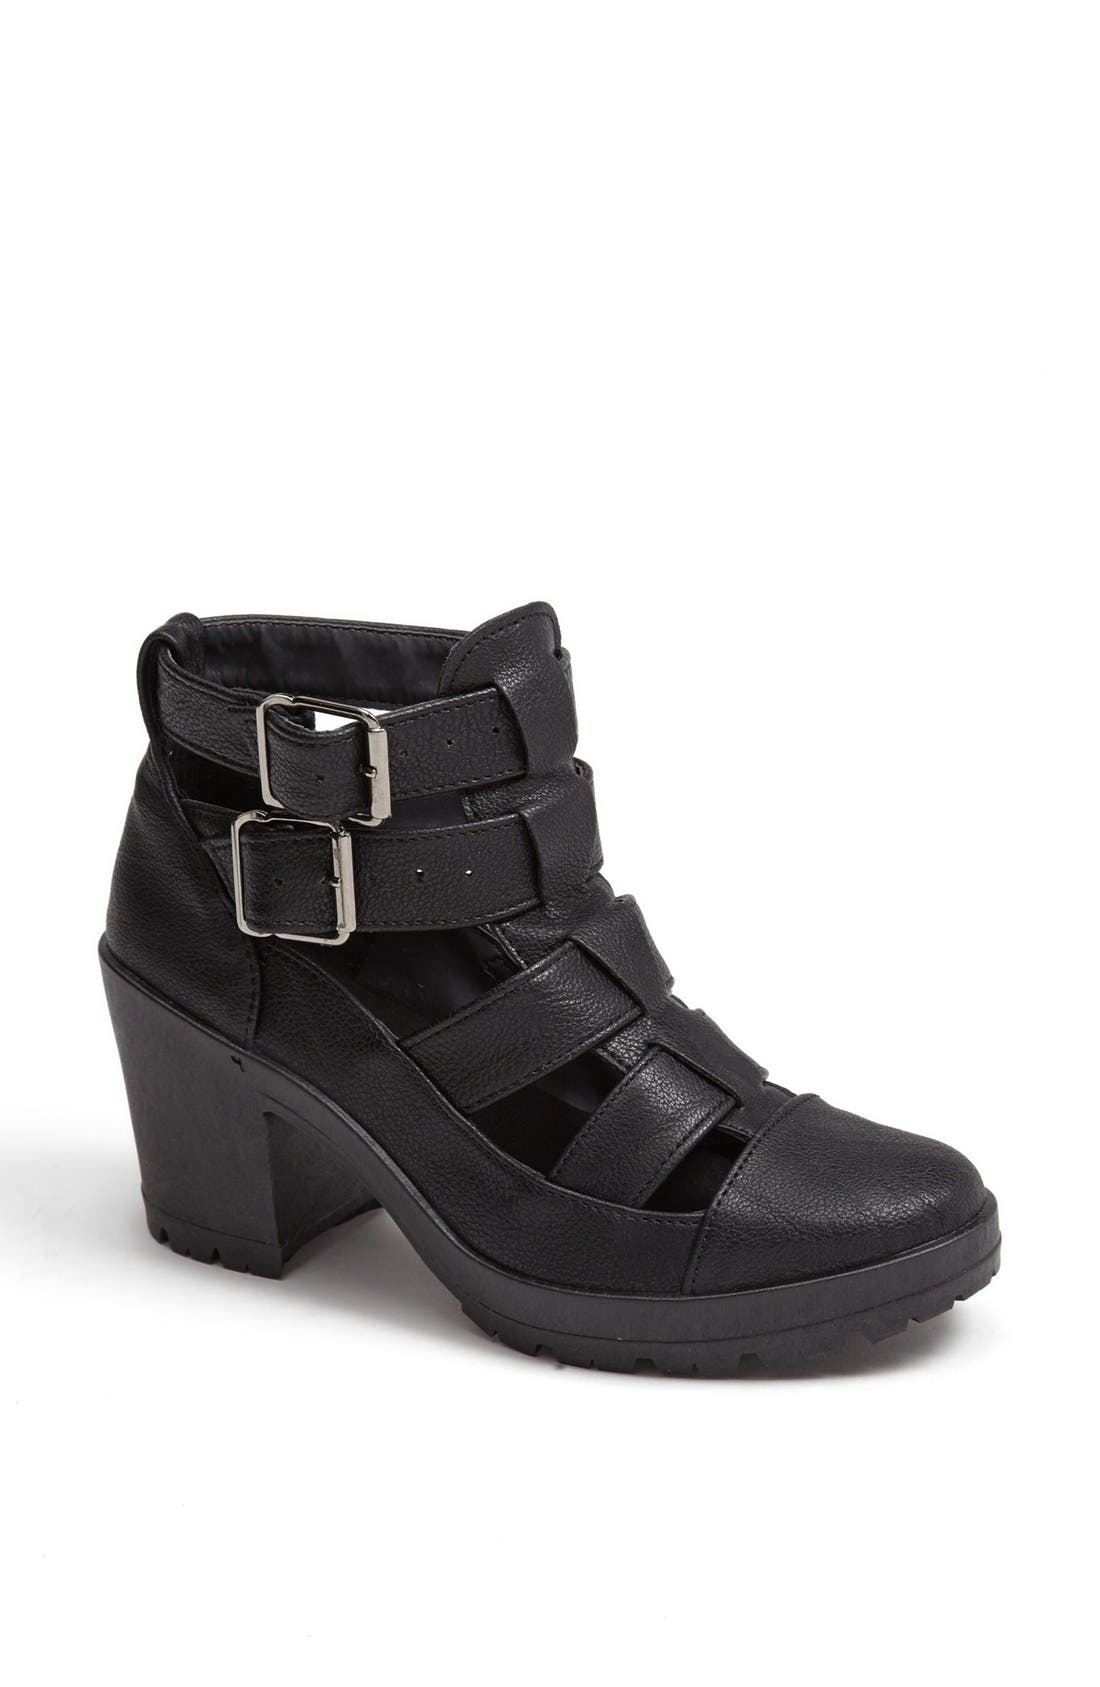 Alternate Image 1 Selected - Topshop 'Mega' Ankle Boot